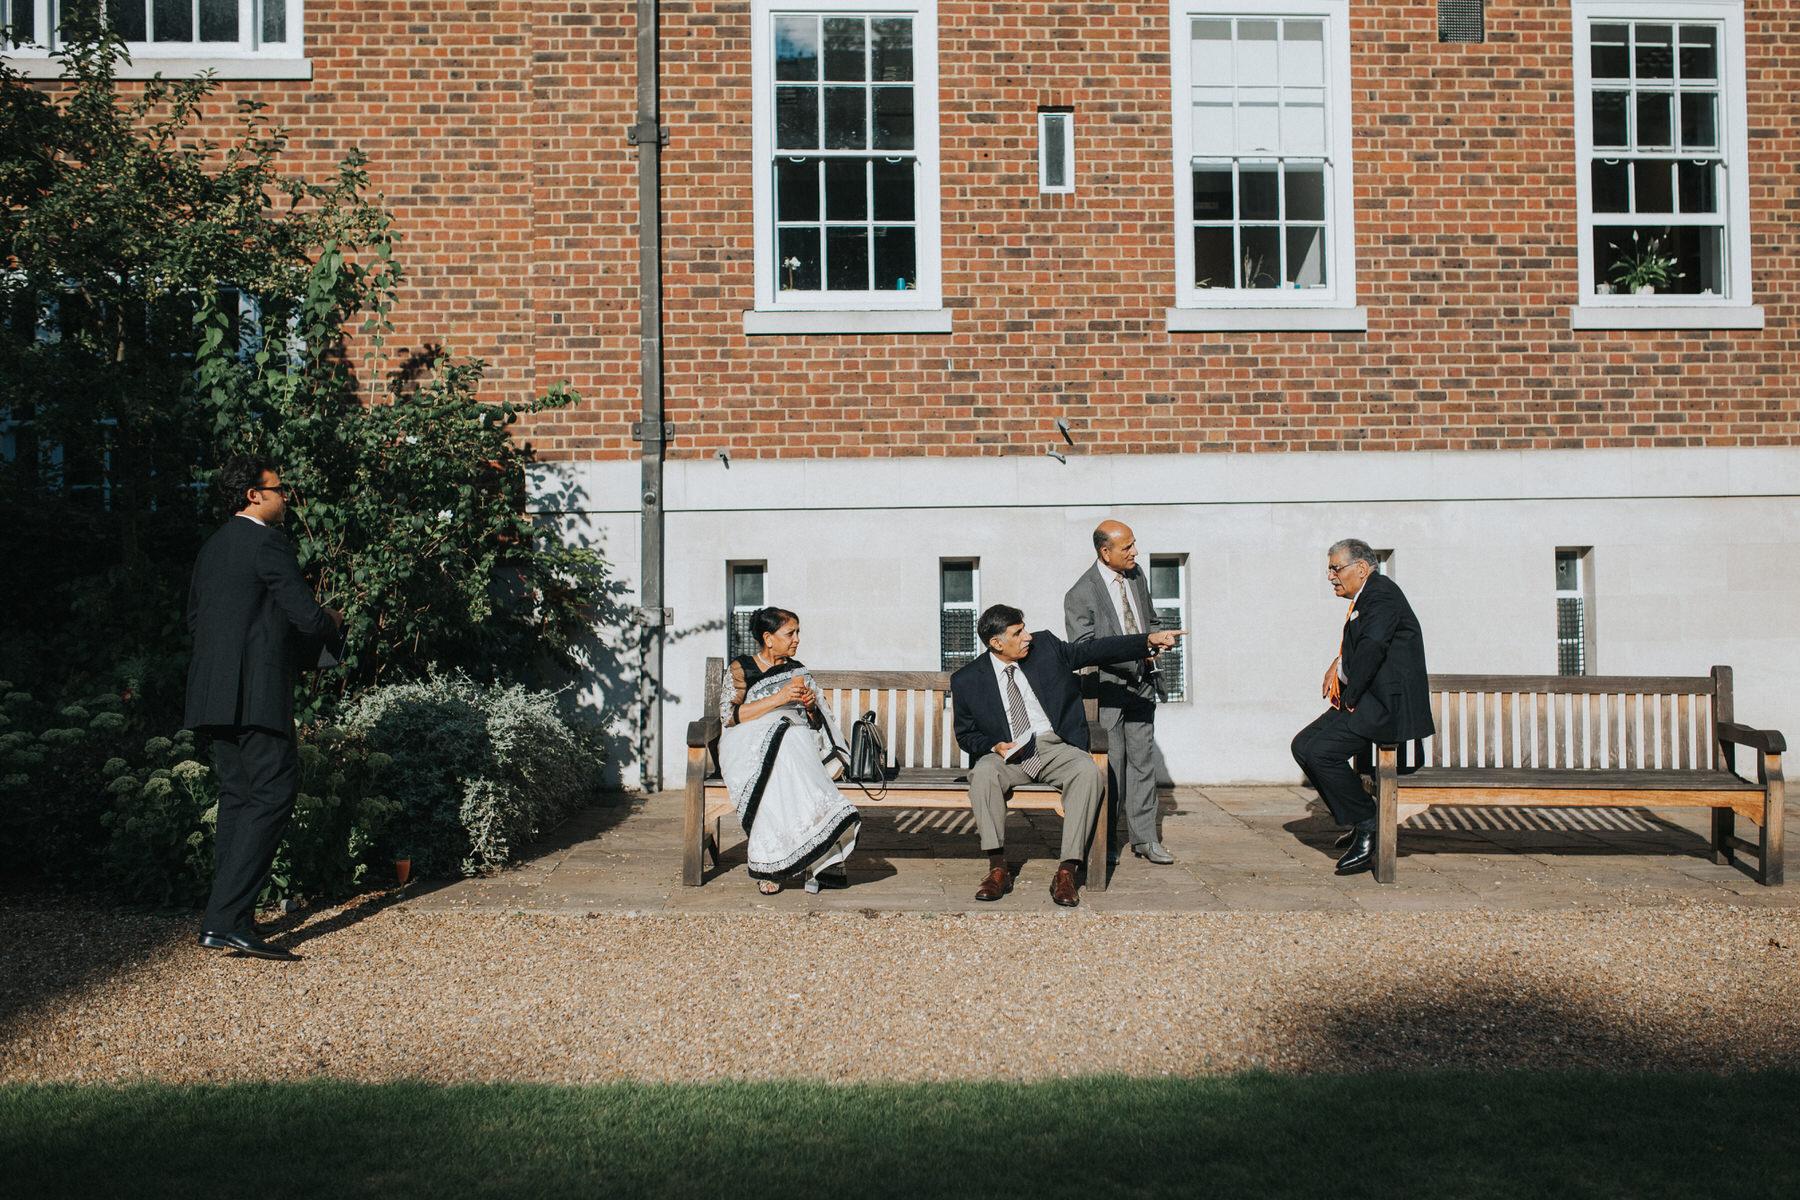 149-Anglo-Asian-London-Wedding-guests-relaxing-garden.jpg